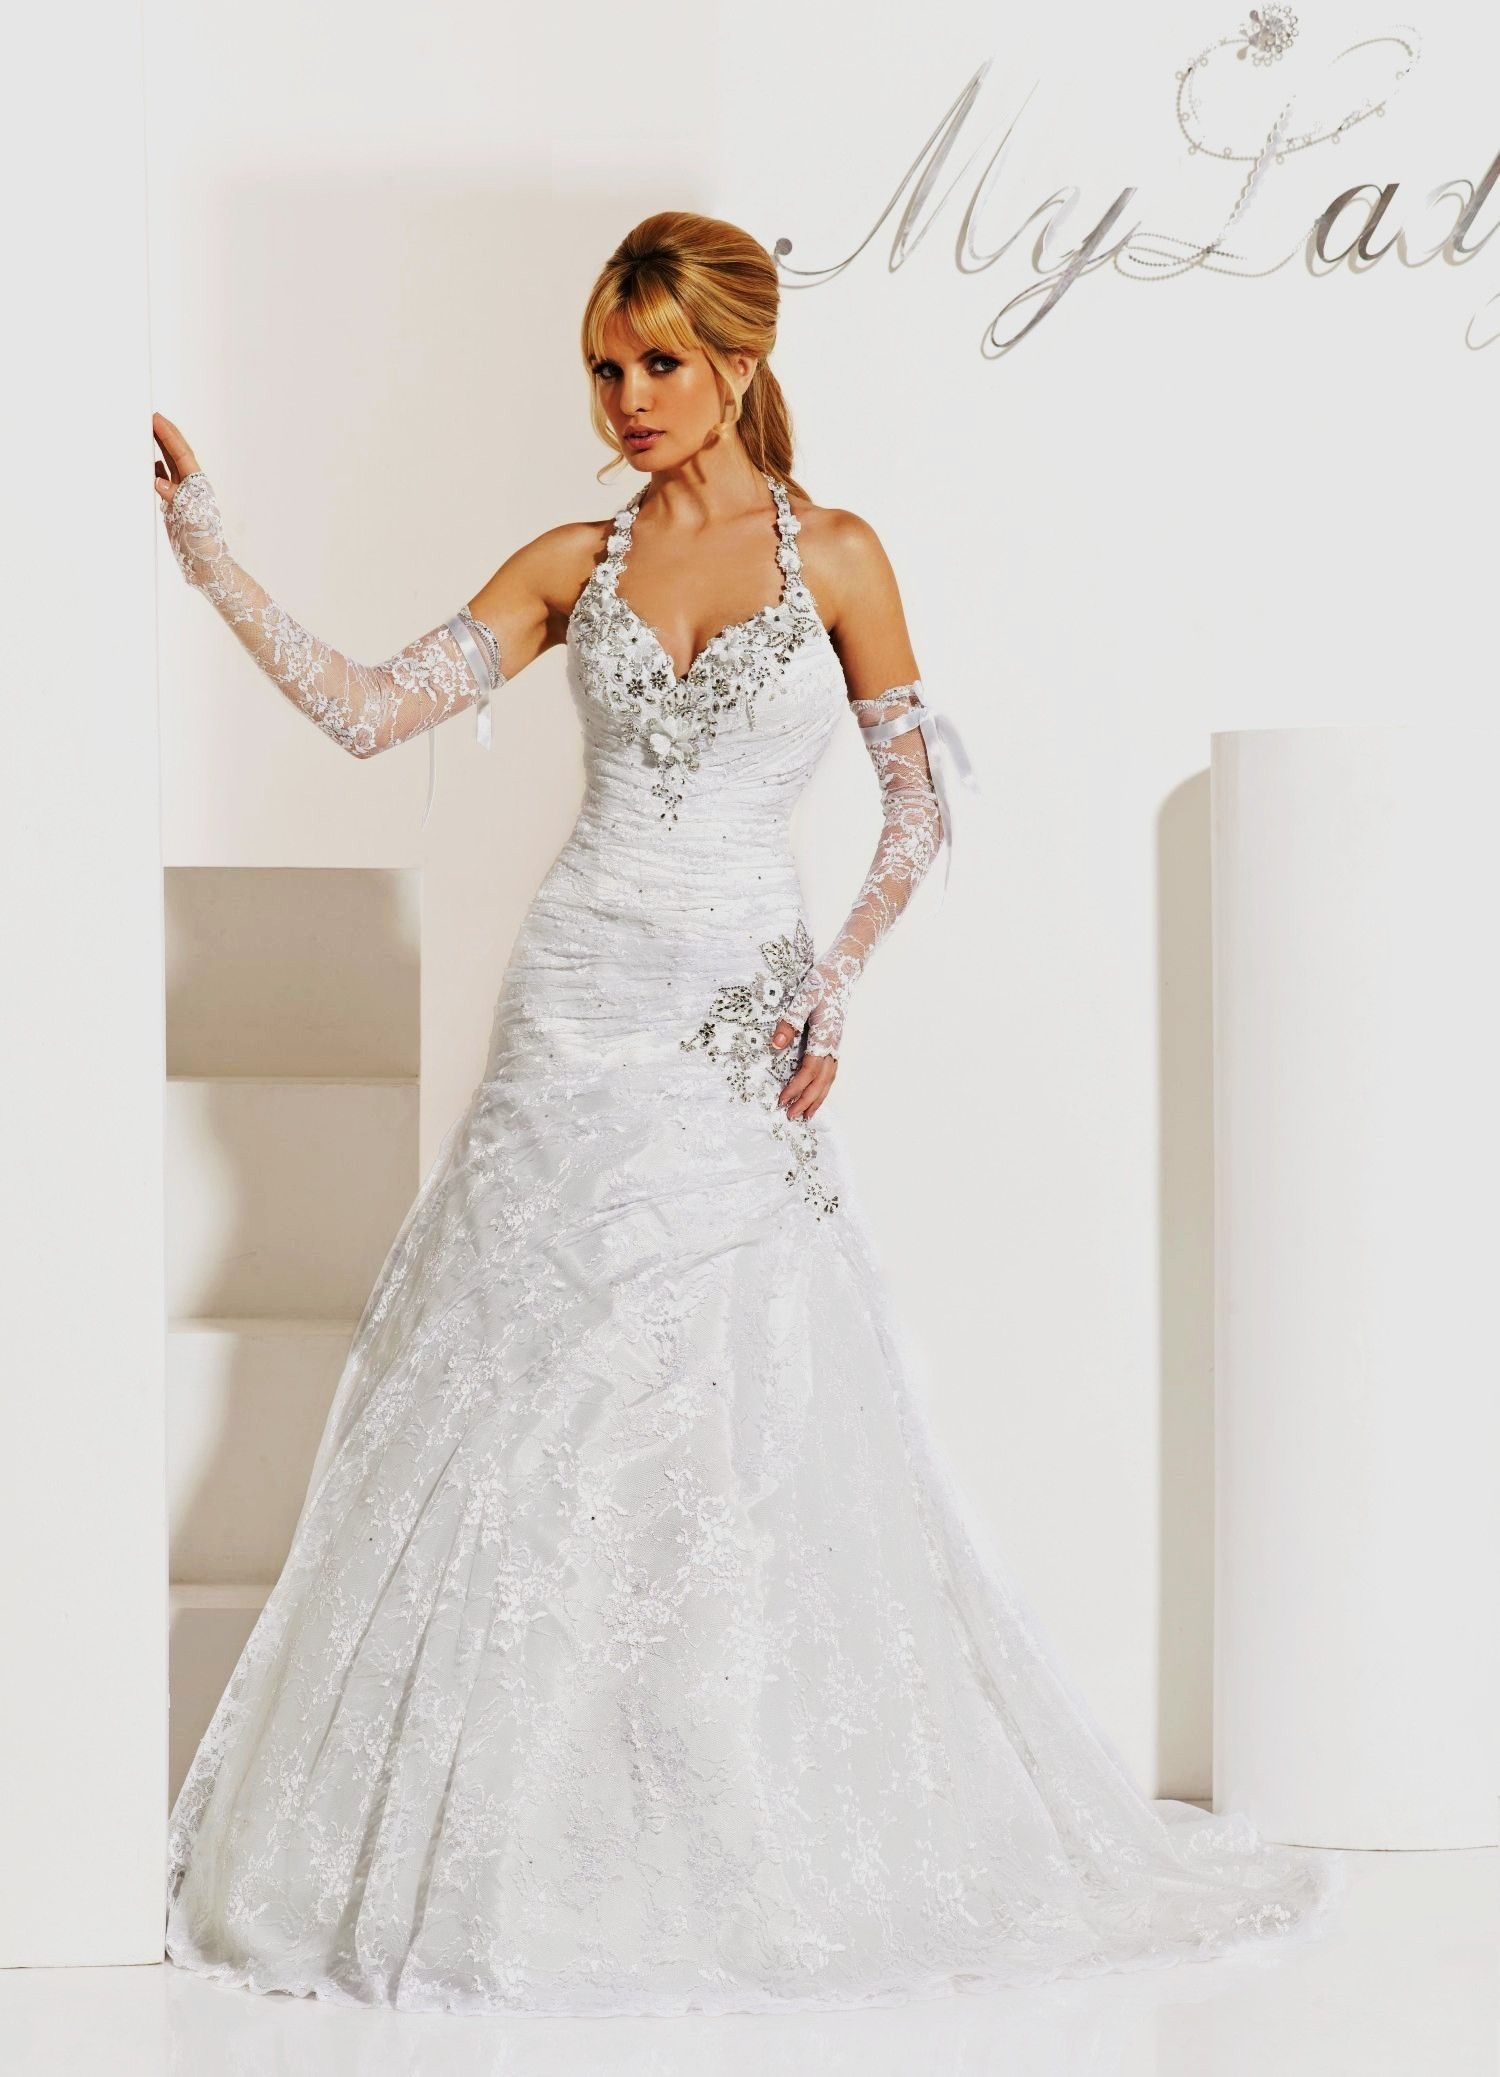 swarovski wedding dress<3 | dream wedding | Pinterest